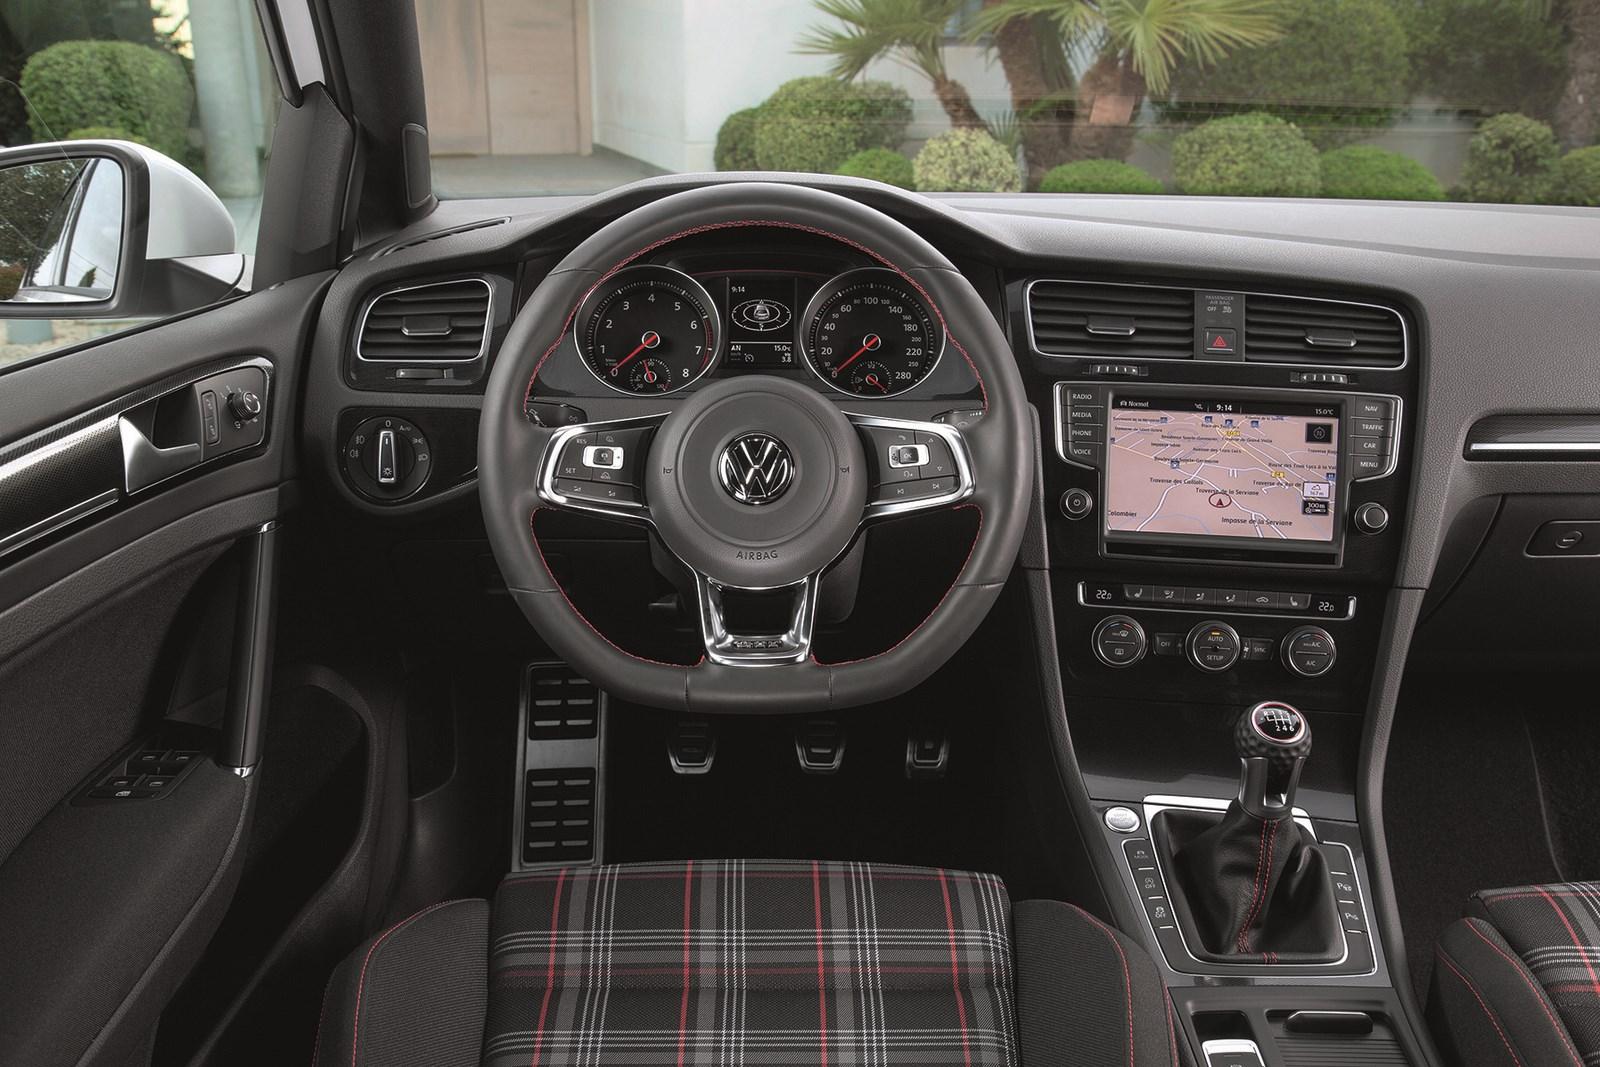 vw golf 7 manual various owner manual guide u2022 rh justk co Volkswagen Golf TDI Volkswagen Golf 2000